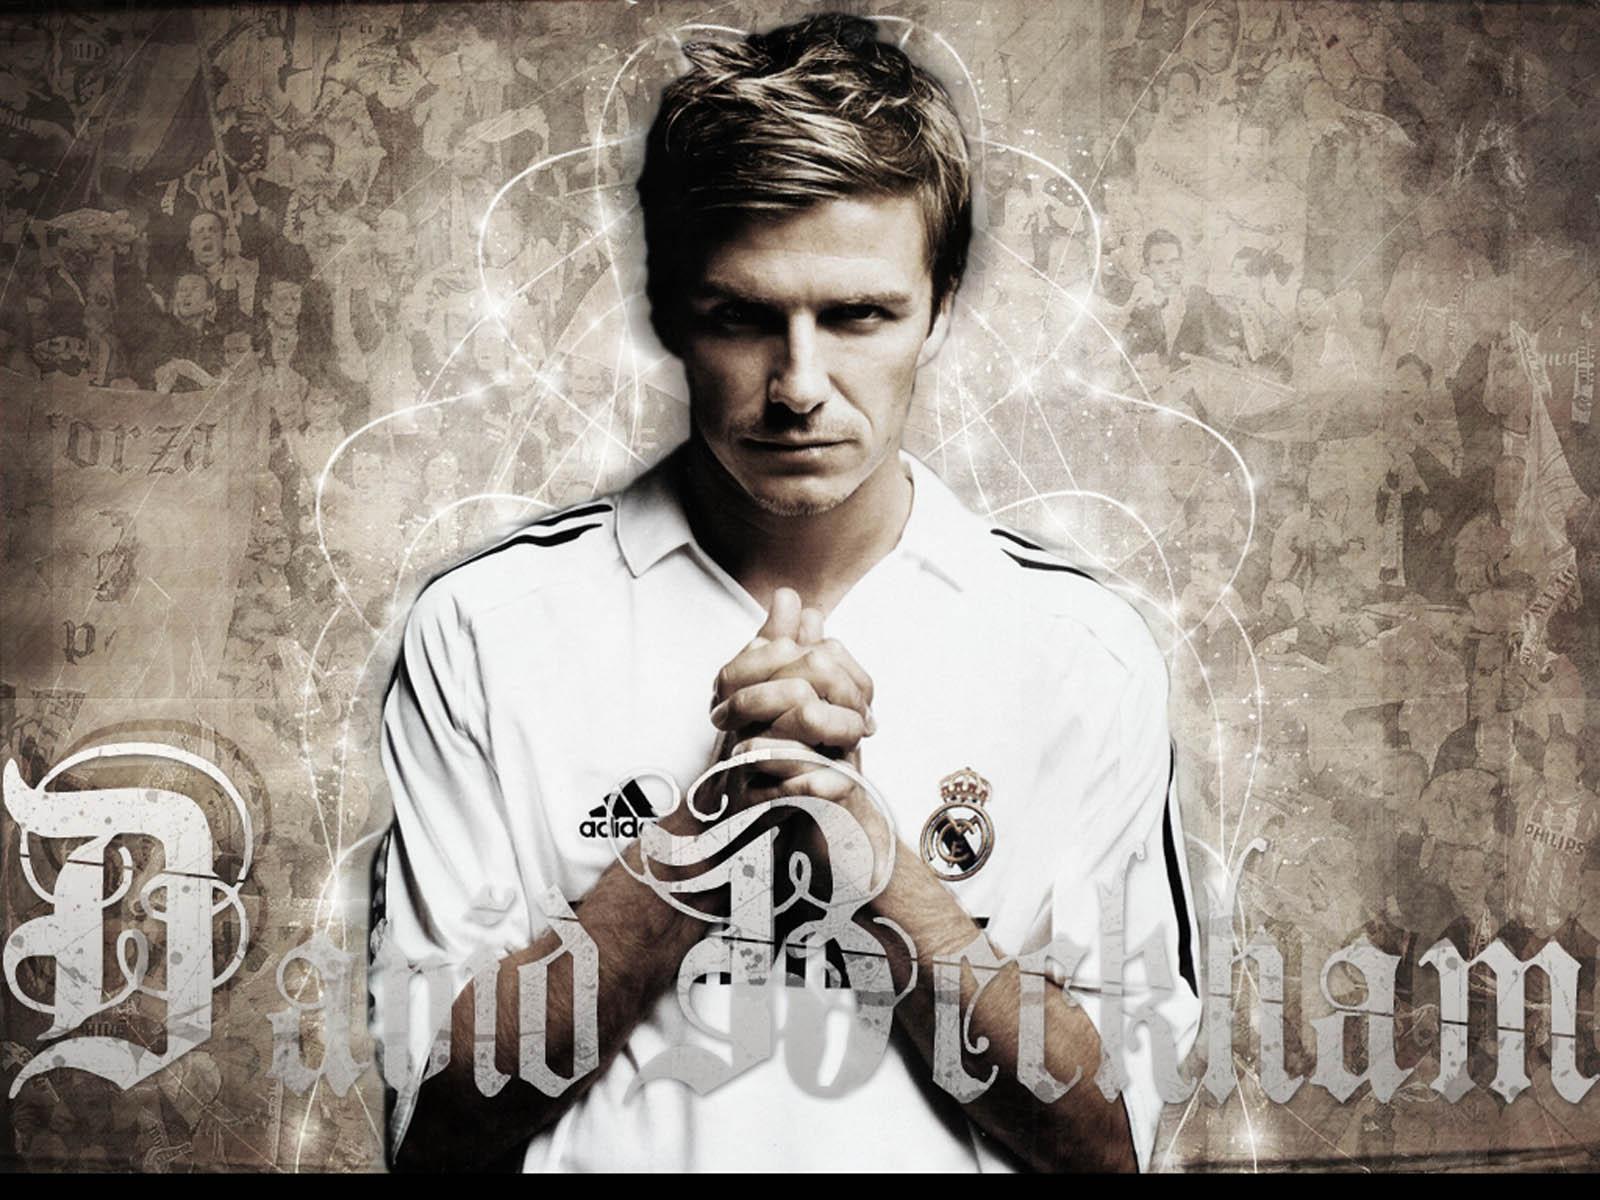 David <b>Beckham Wallpaper</b> Hd 22739 | PCMODE